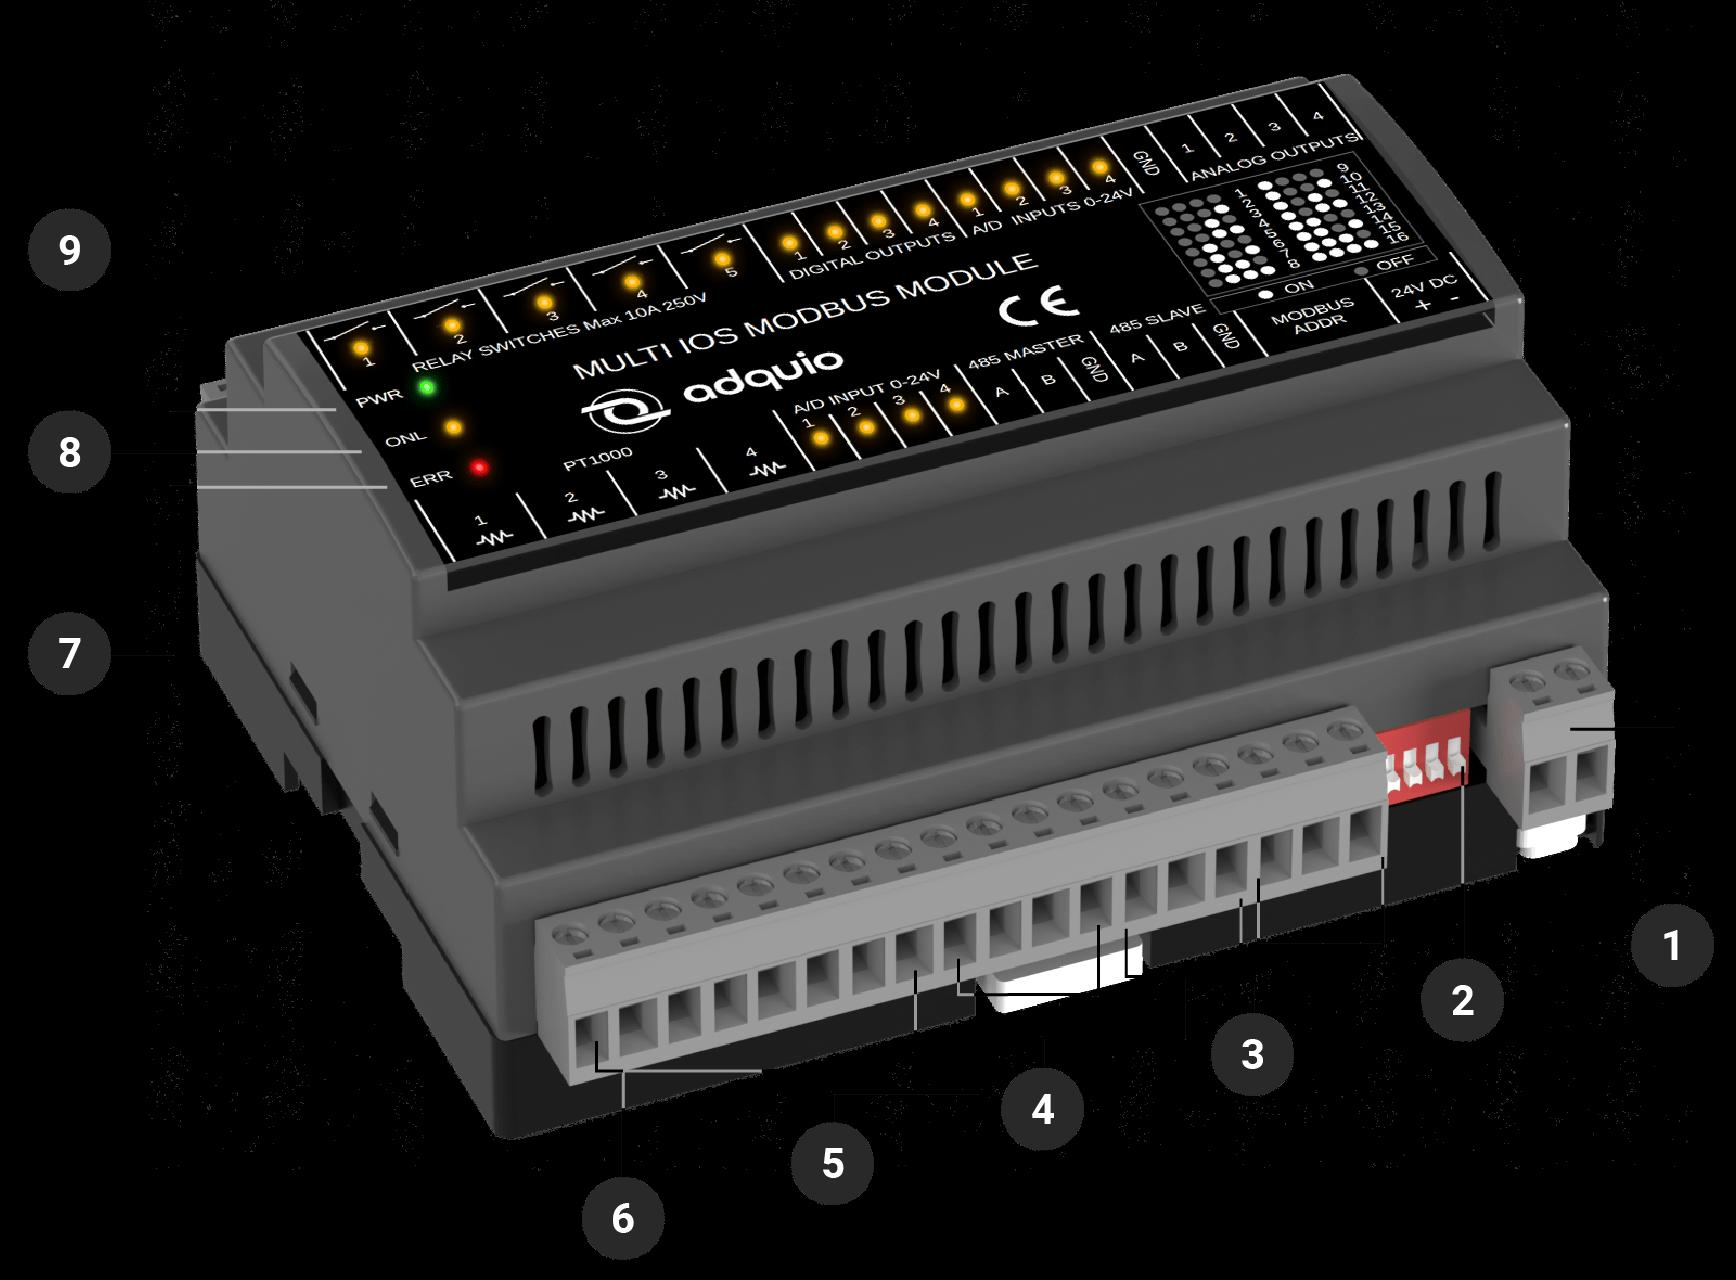 Conectores delanteros adquio multi IOs modbus module